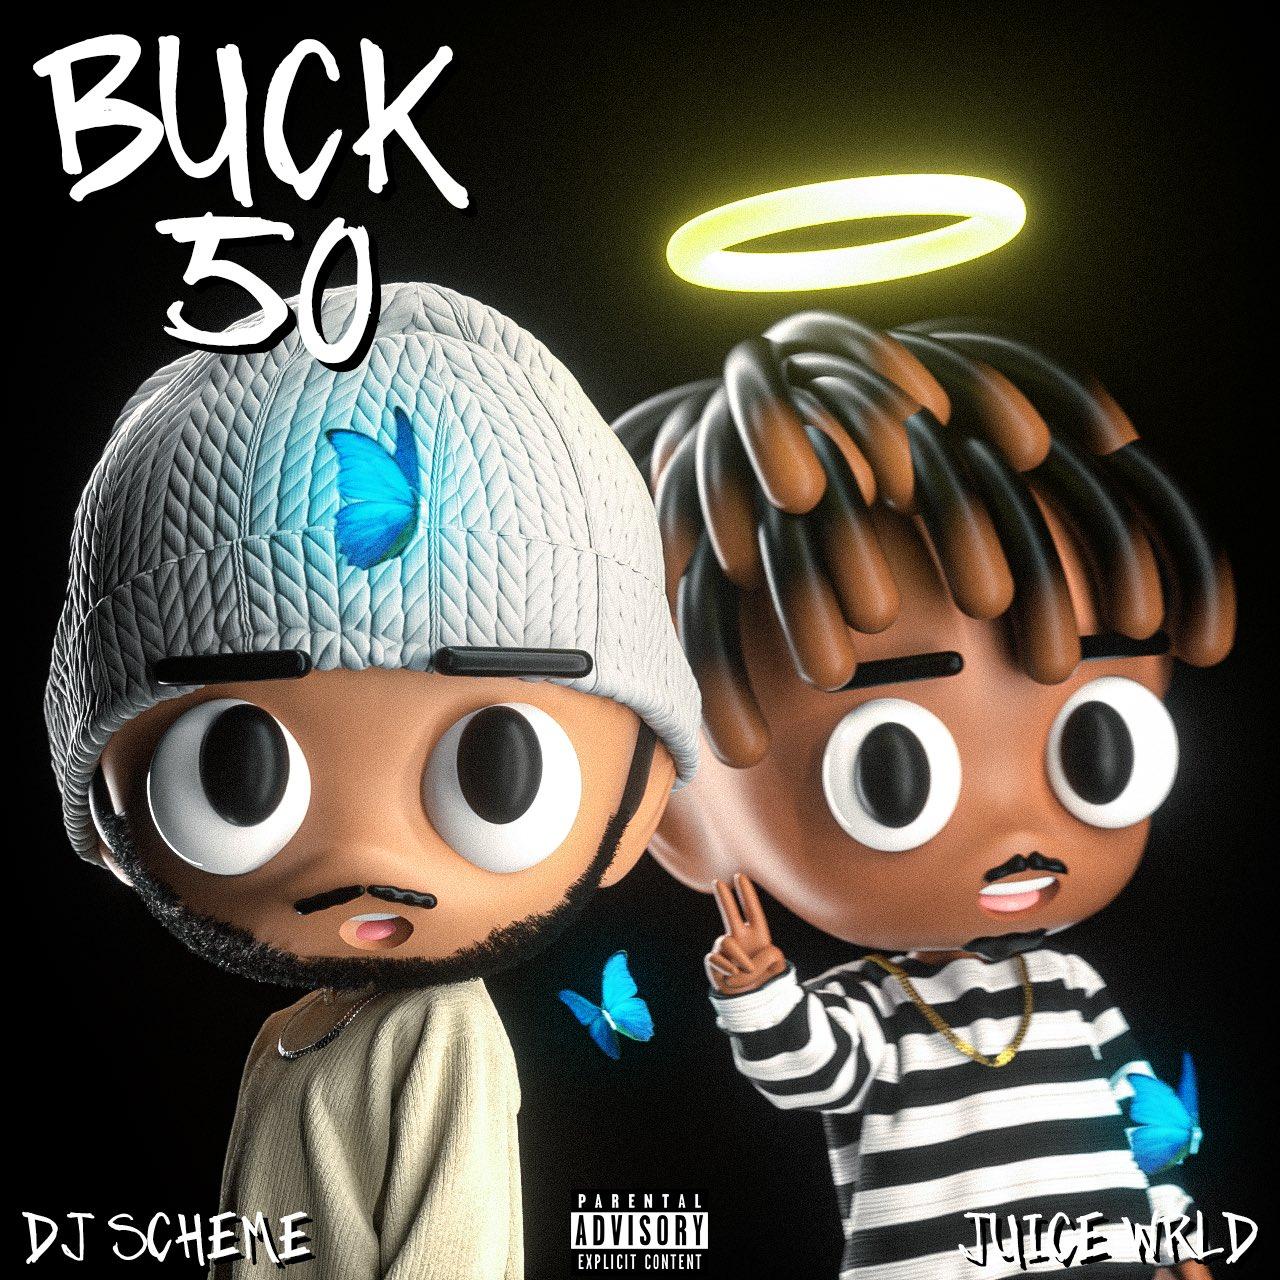 DJ Scheme Ft. Juice WRLD – Buck 50 Mp3